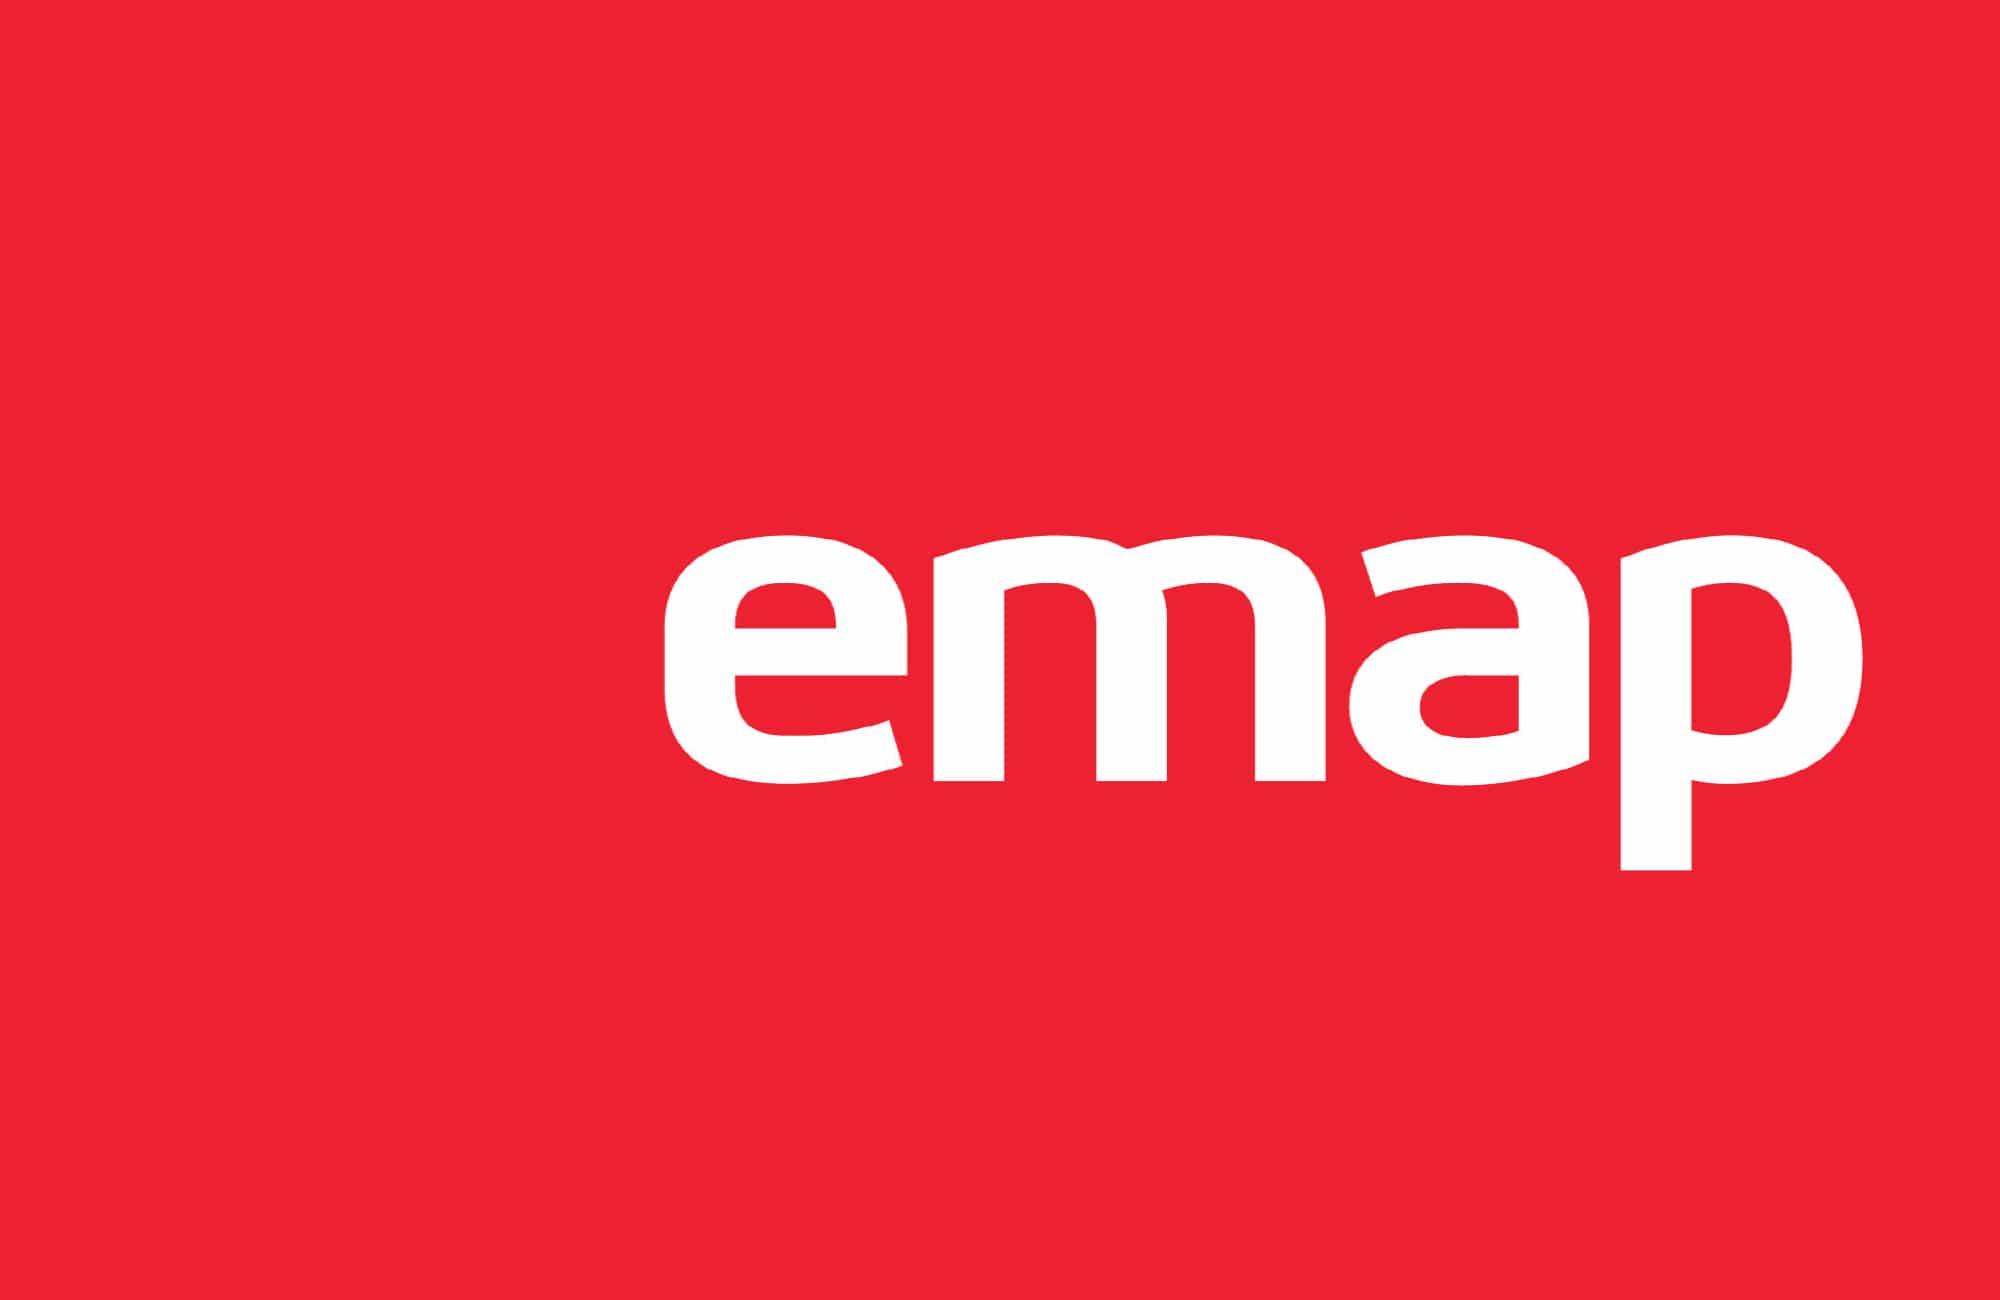 EMAP Plc